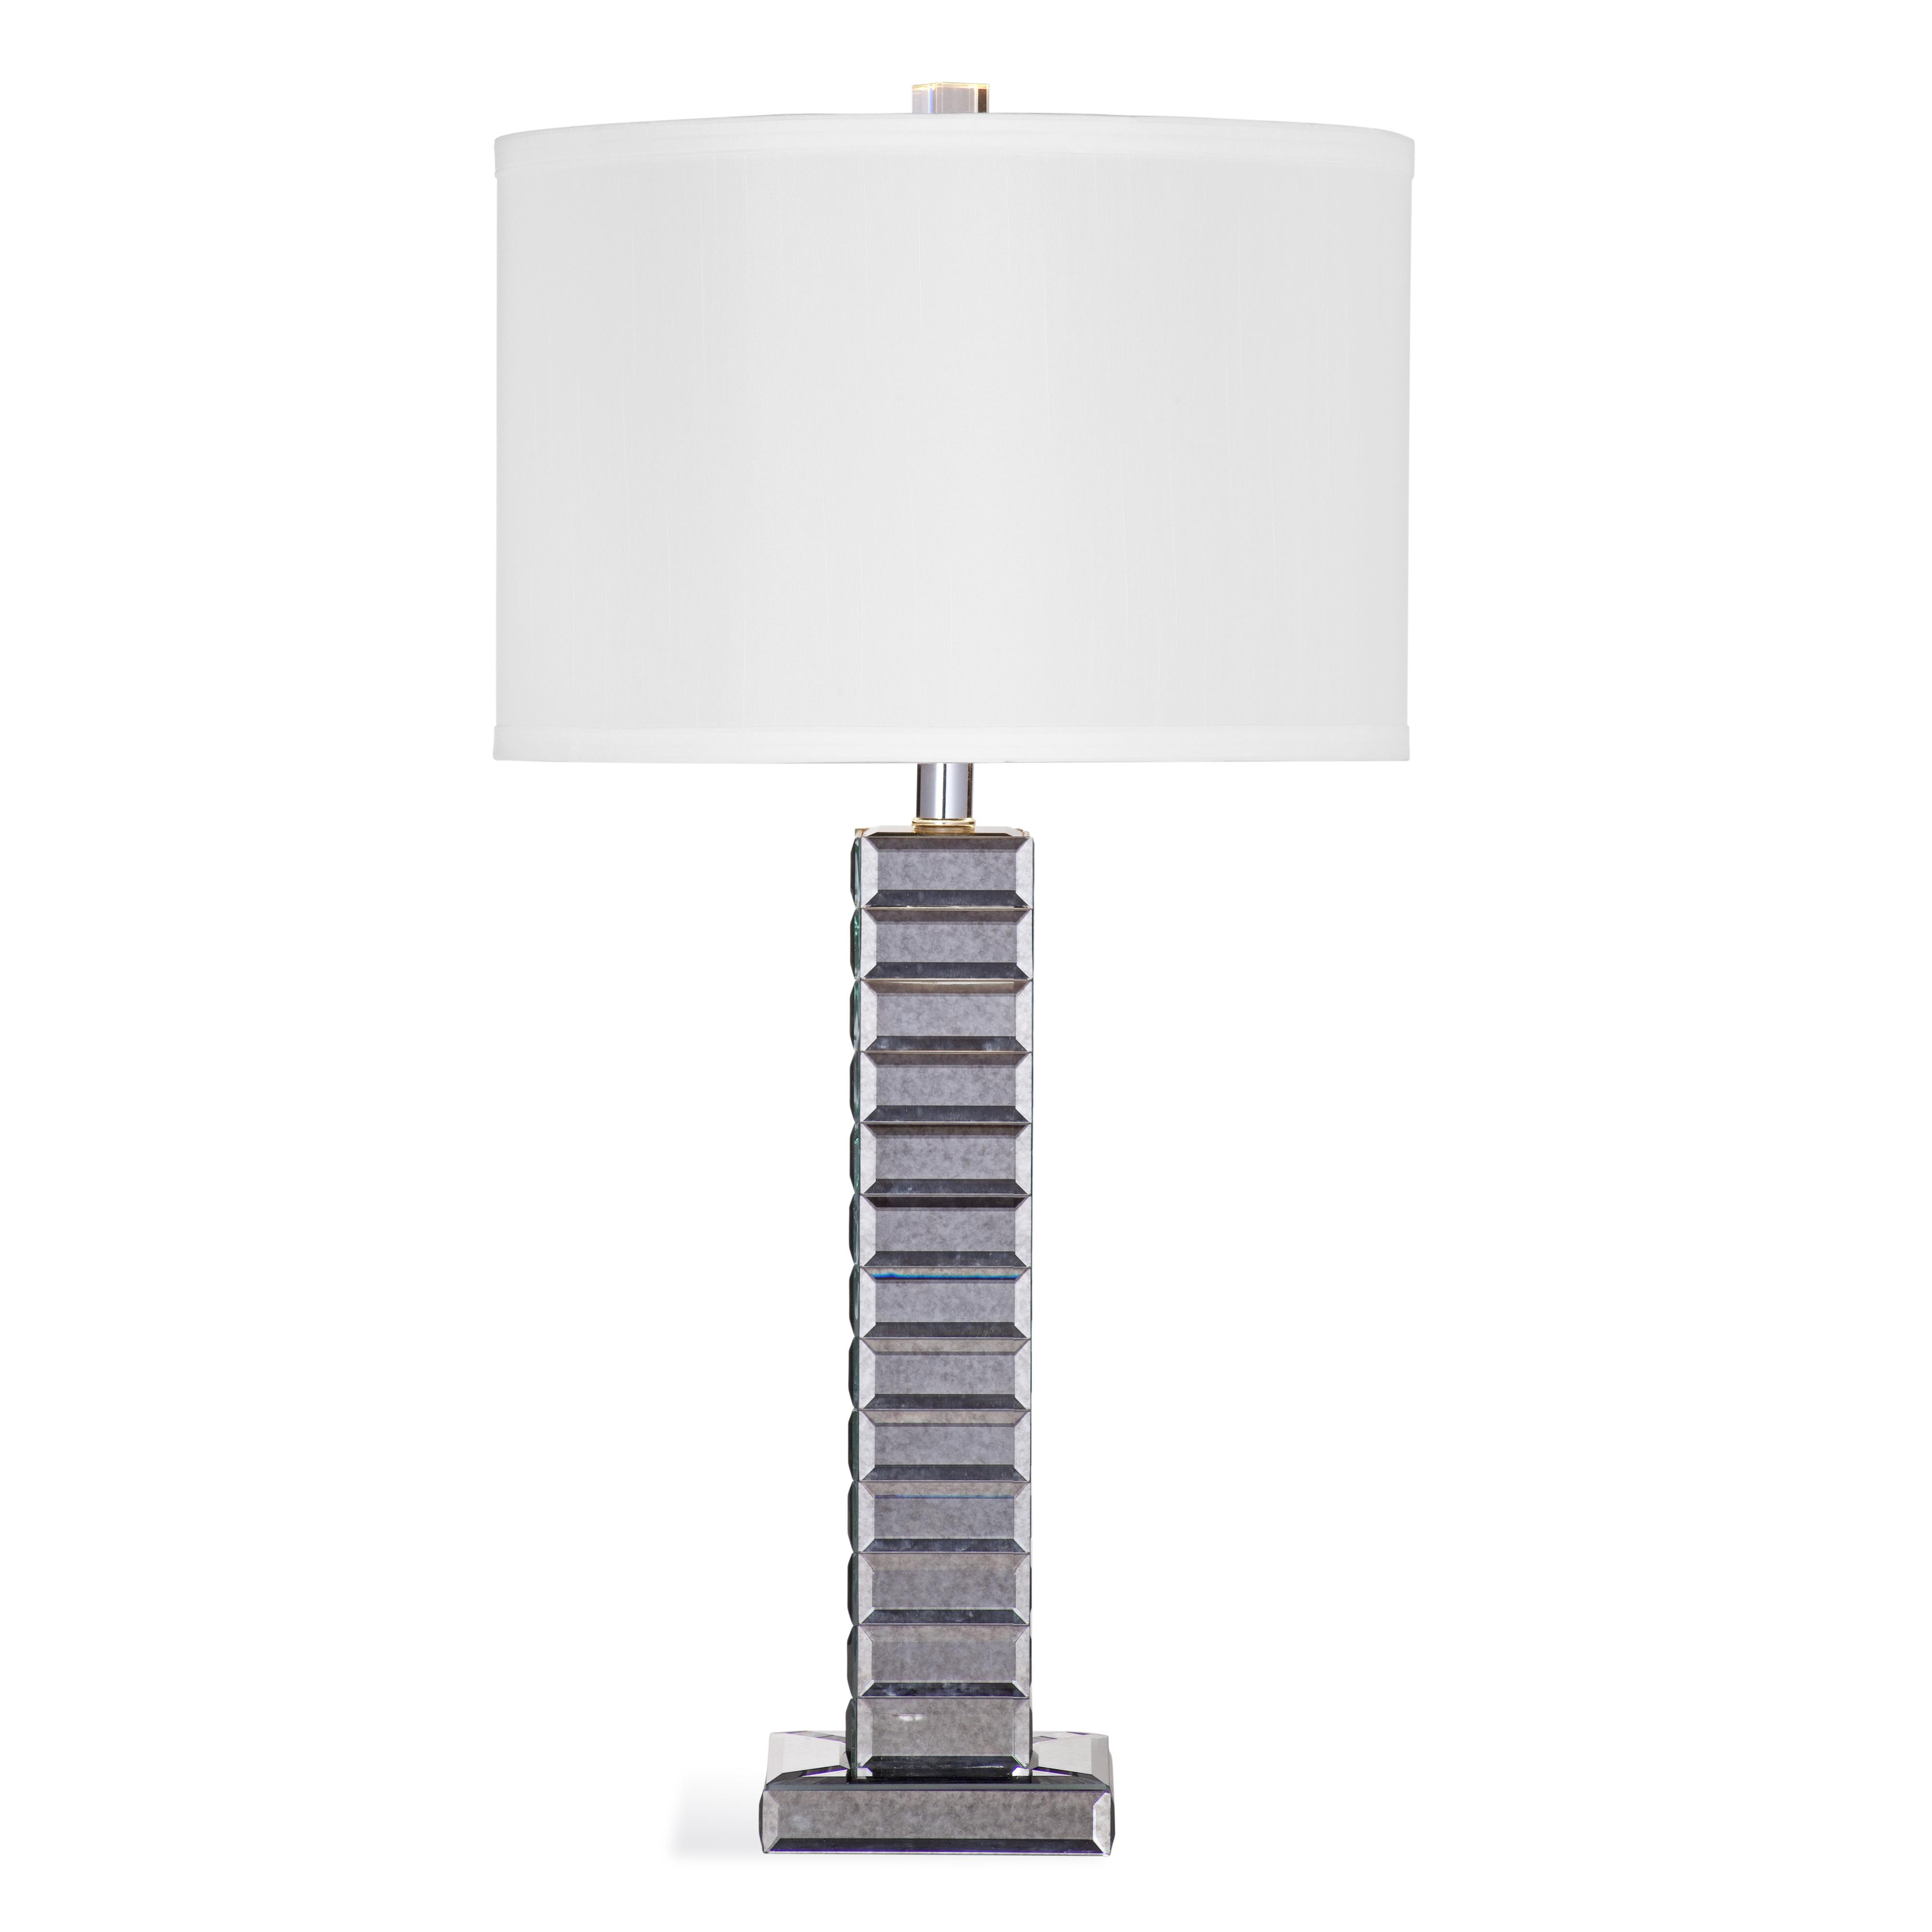 Hollywood Glam Jillian Table Lamp by Bassett Mirror at Alison Craig Home Furnishings